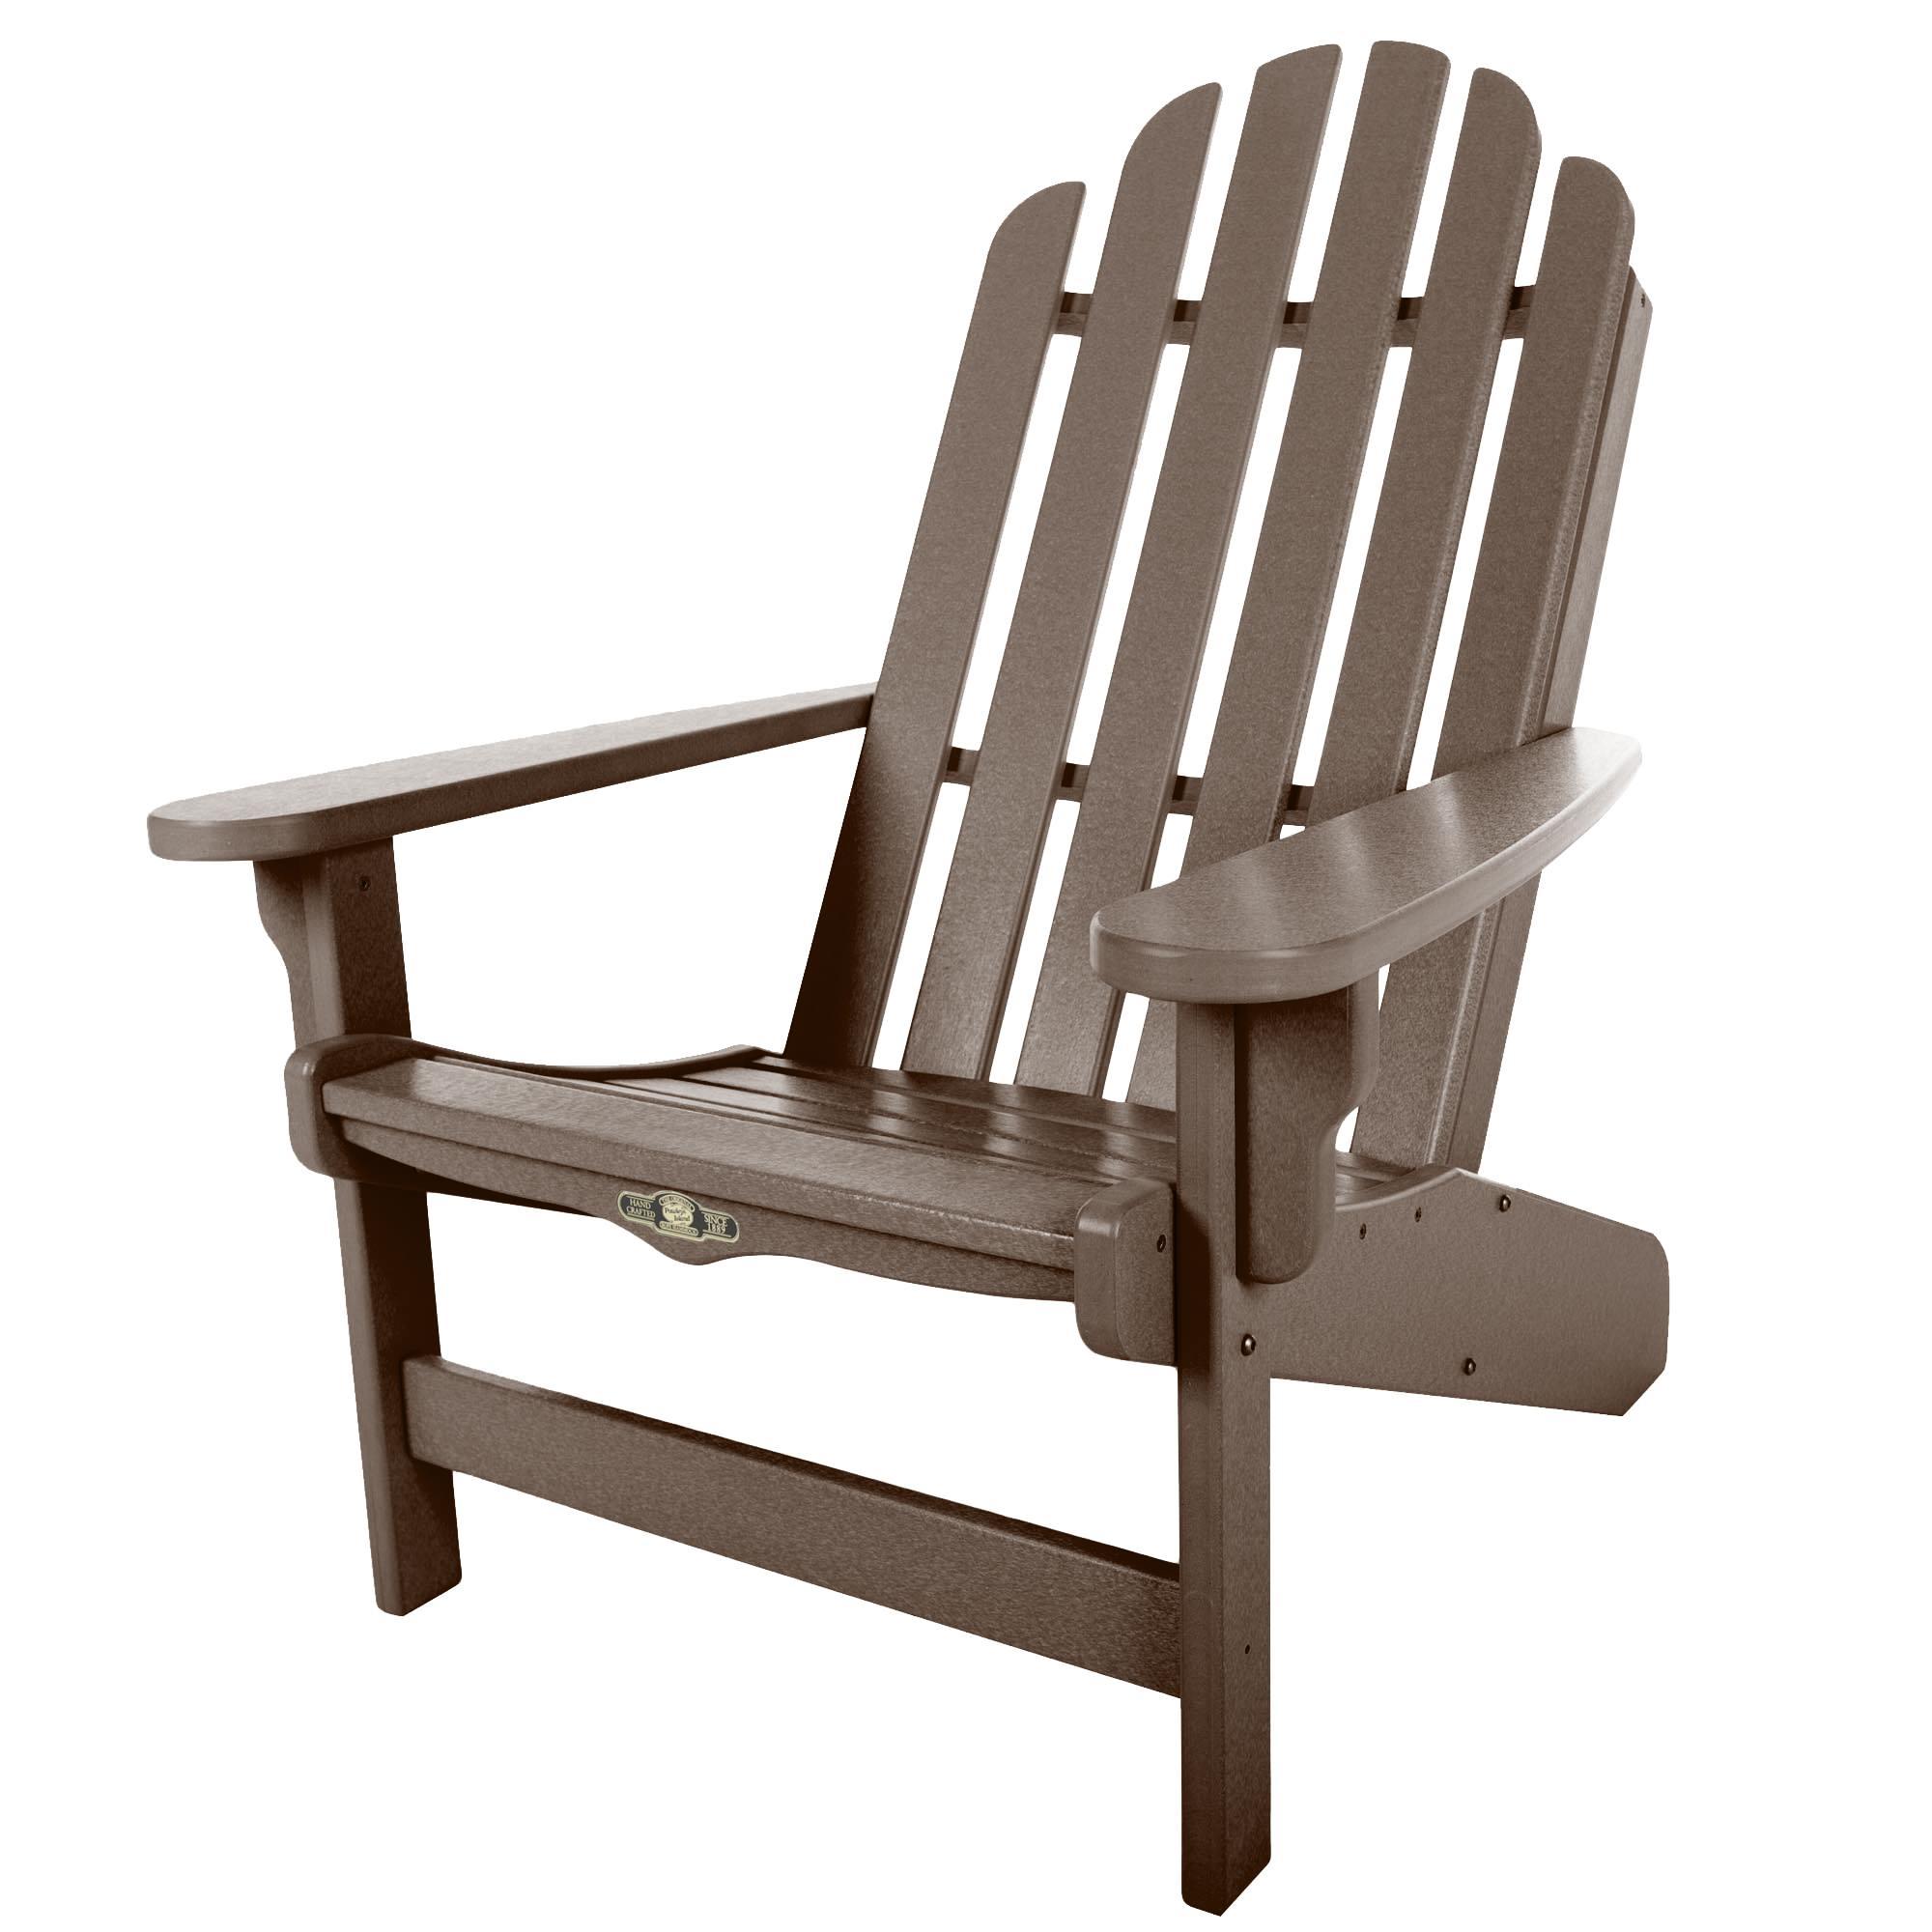 Shop Durawood Essentials Adirondack Chairs on Sale